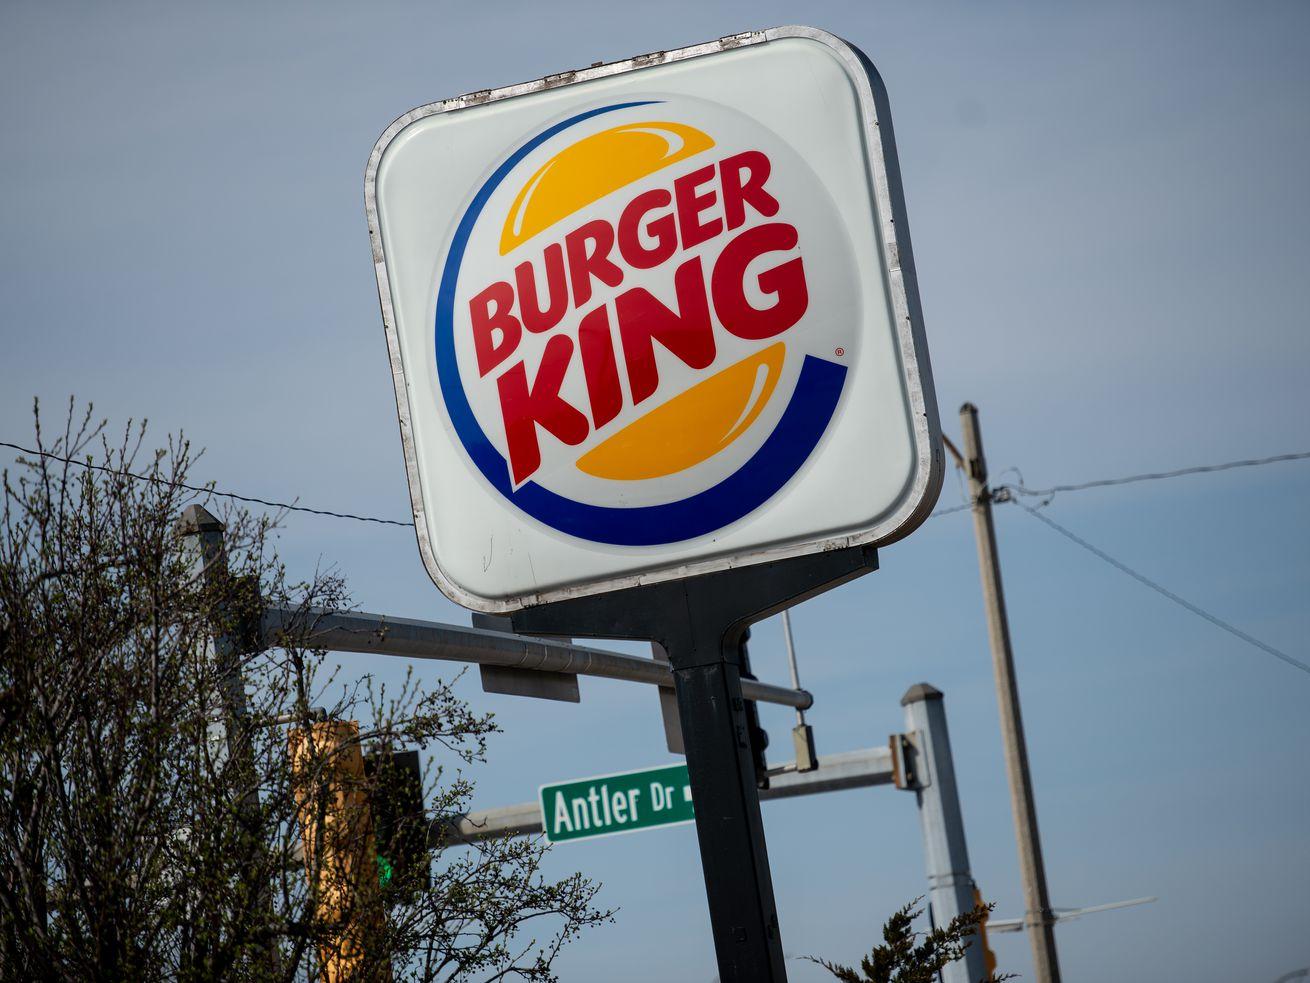 Burger King restaurant in Missouri